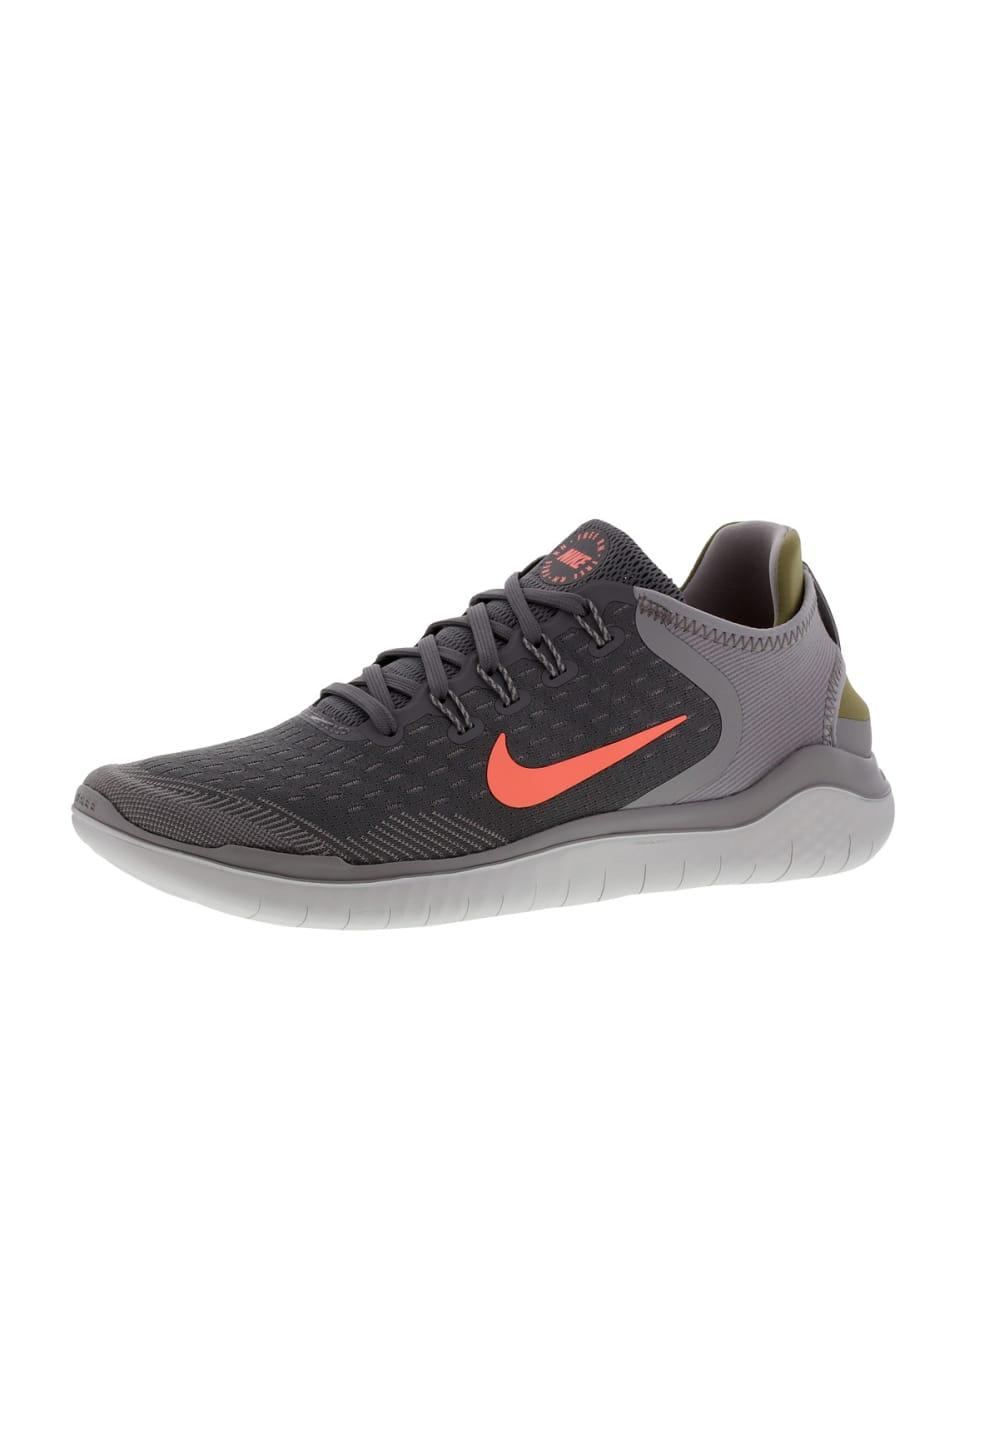 le dernier 2e6d9 cc34f Nike Free RN 2018 - Running shoes for Women - Grey